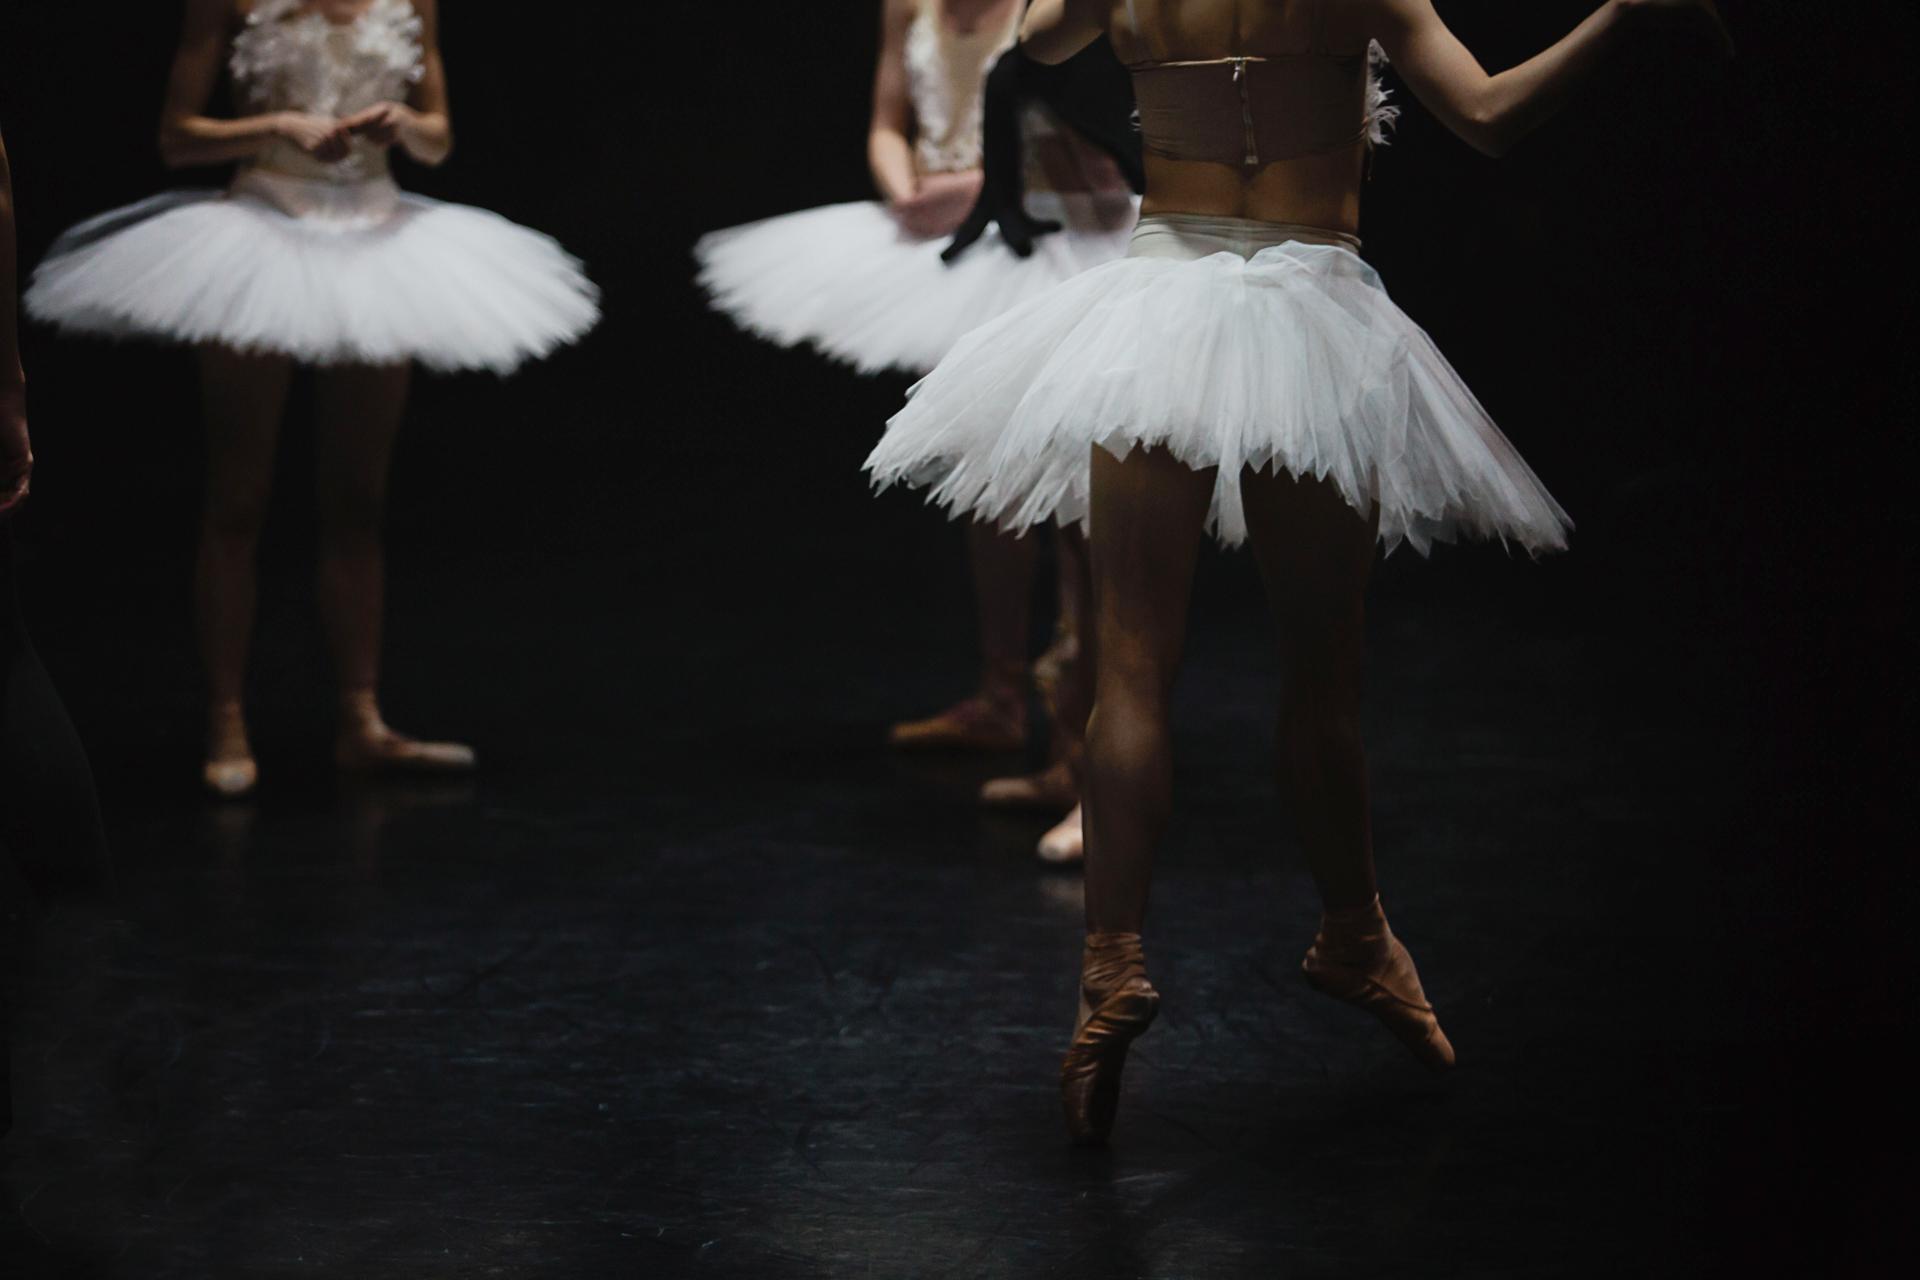 2_Dance_Photographer_International-Australia-Newyork_Quince-and-Mulberry-Studios-g2